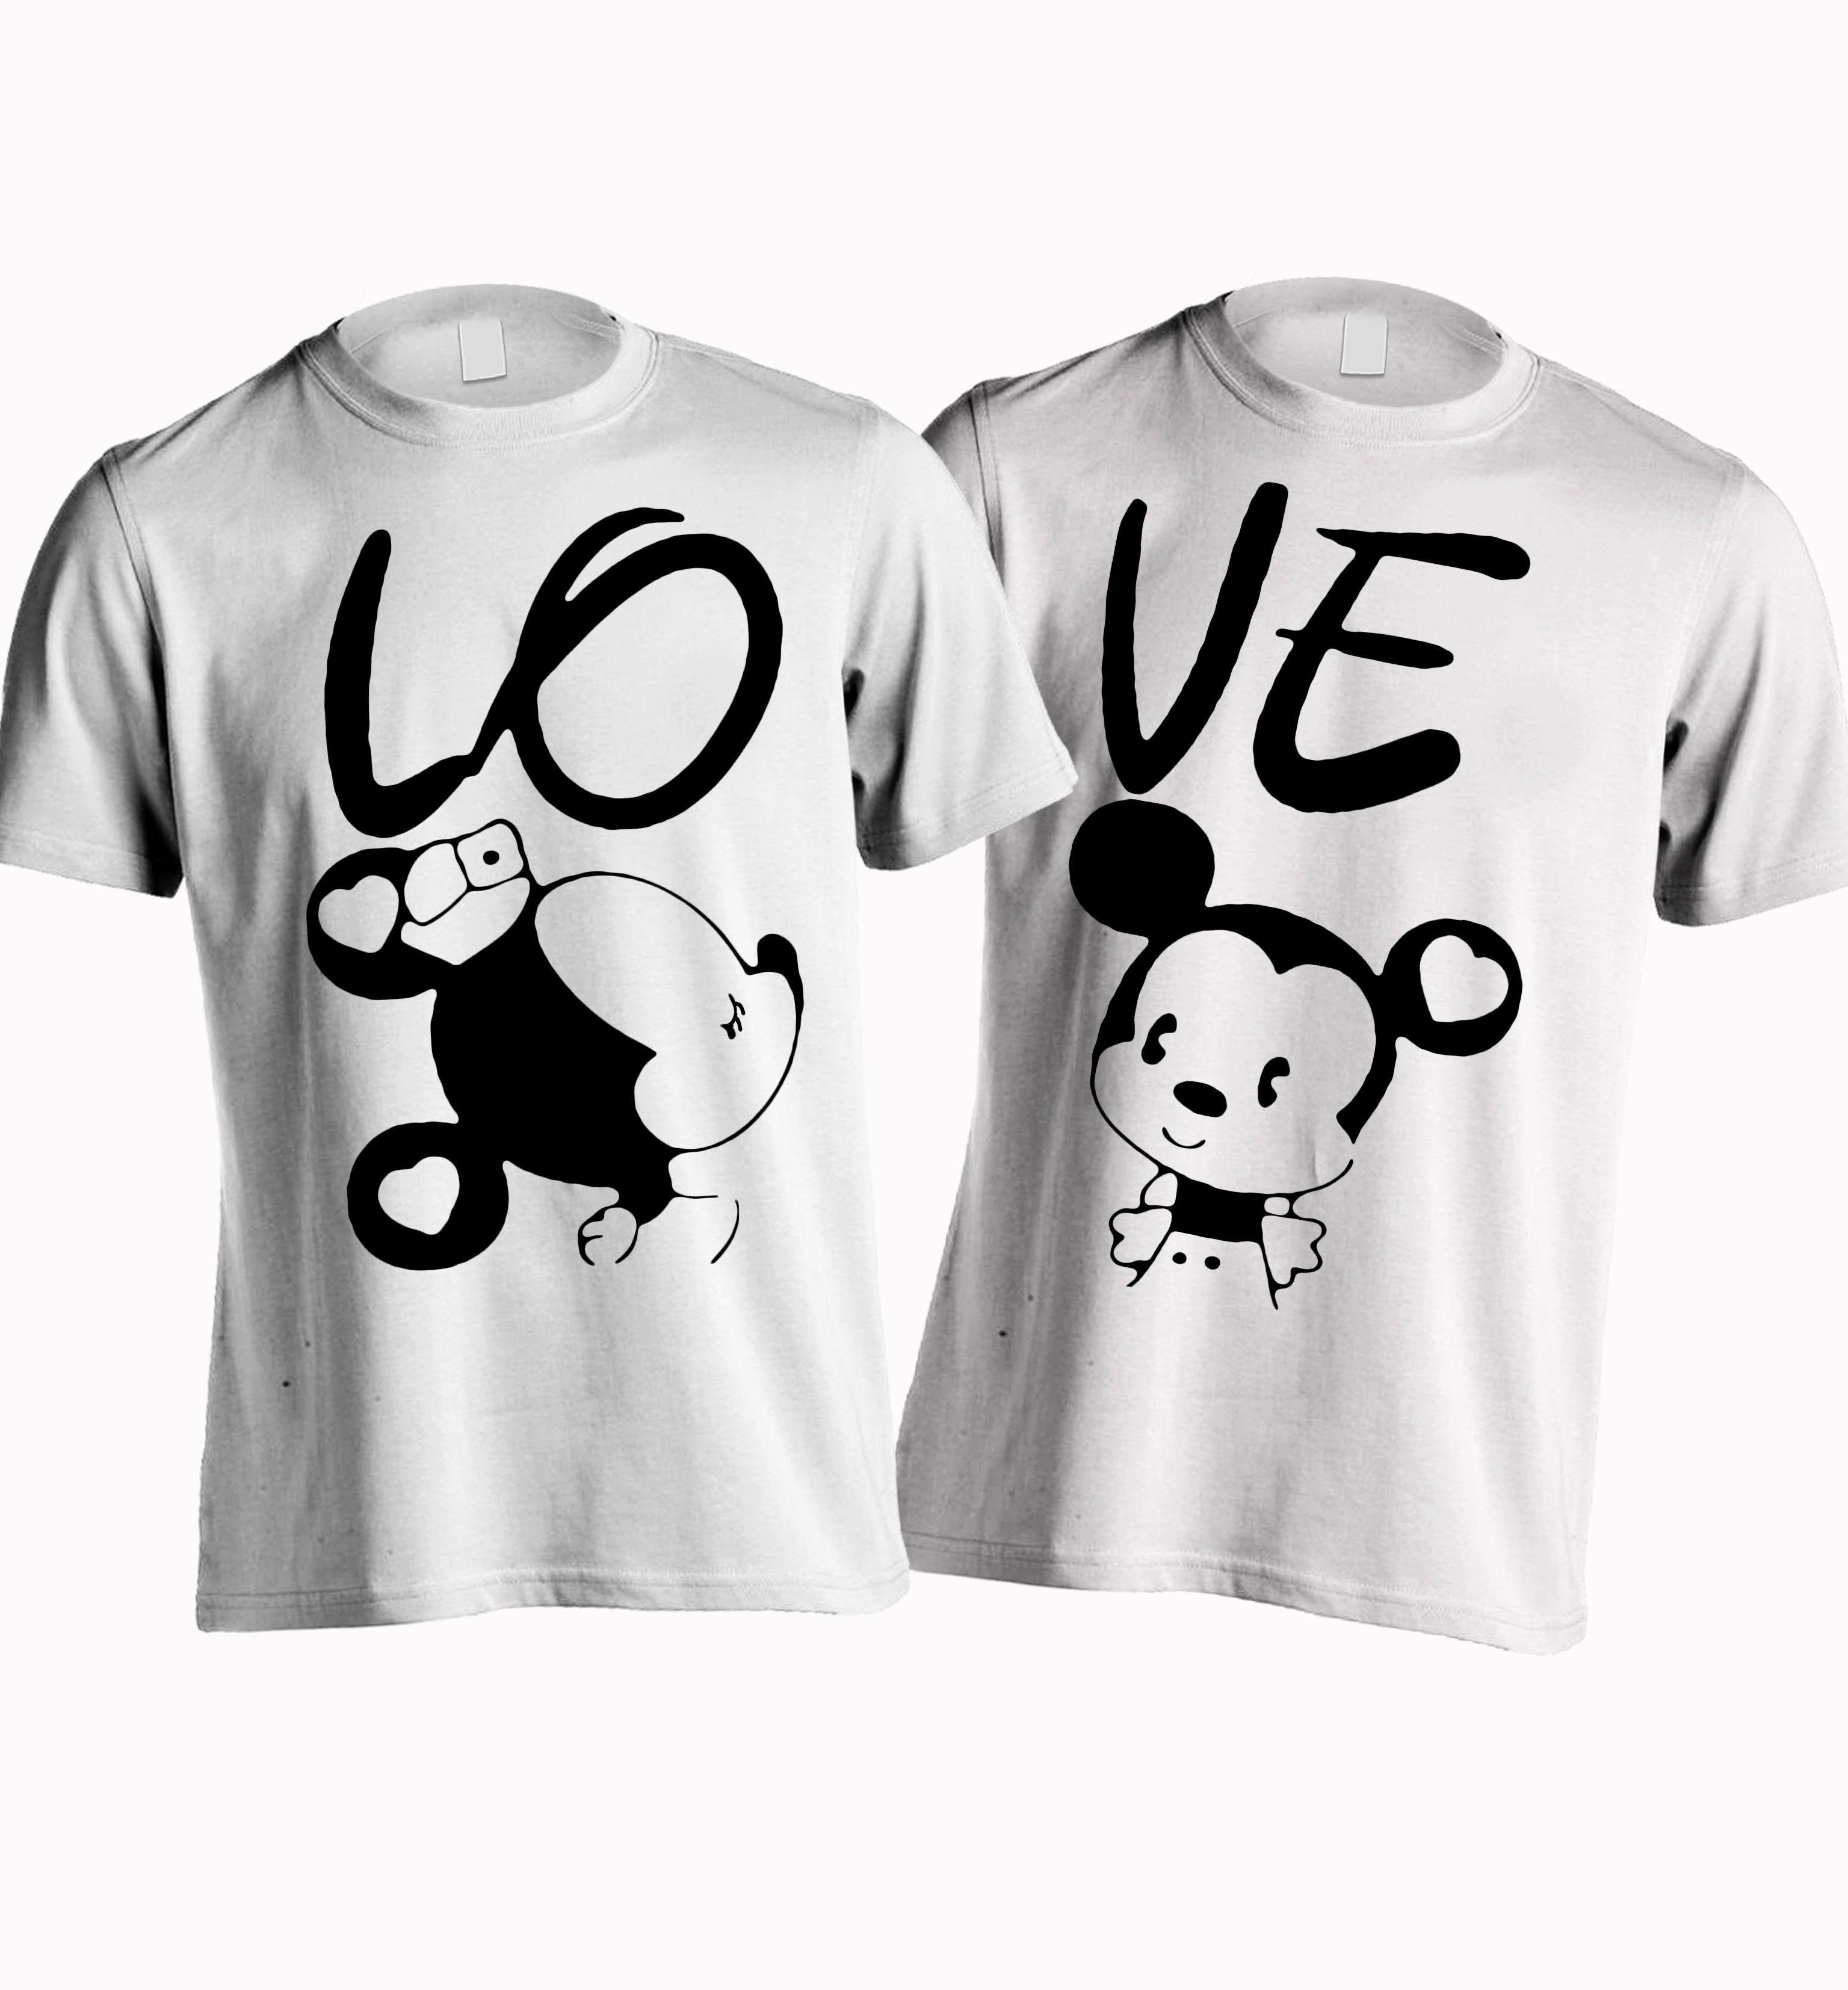 Black t shirt on flipkart - Young Trendz Printed Men S Round Neck T Shirt Buy White Young Trendz Printed Men S